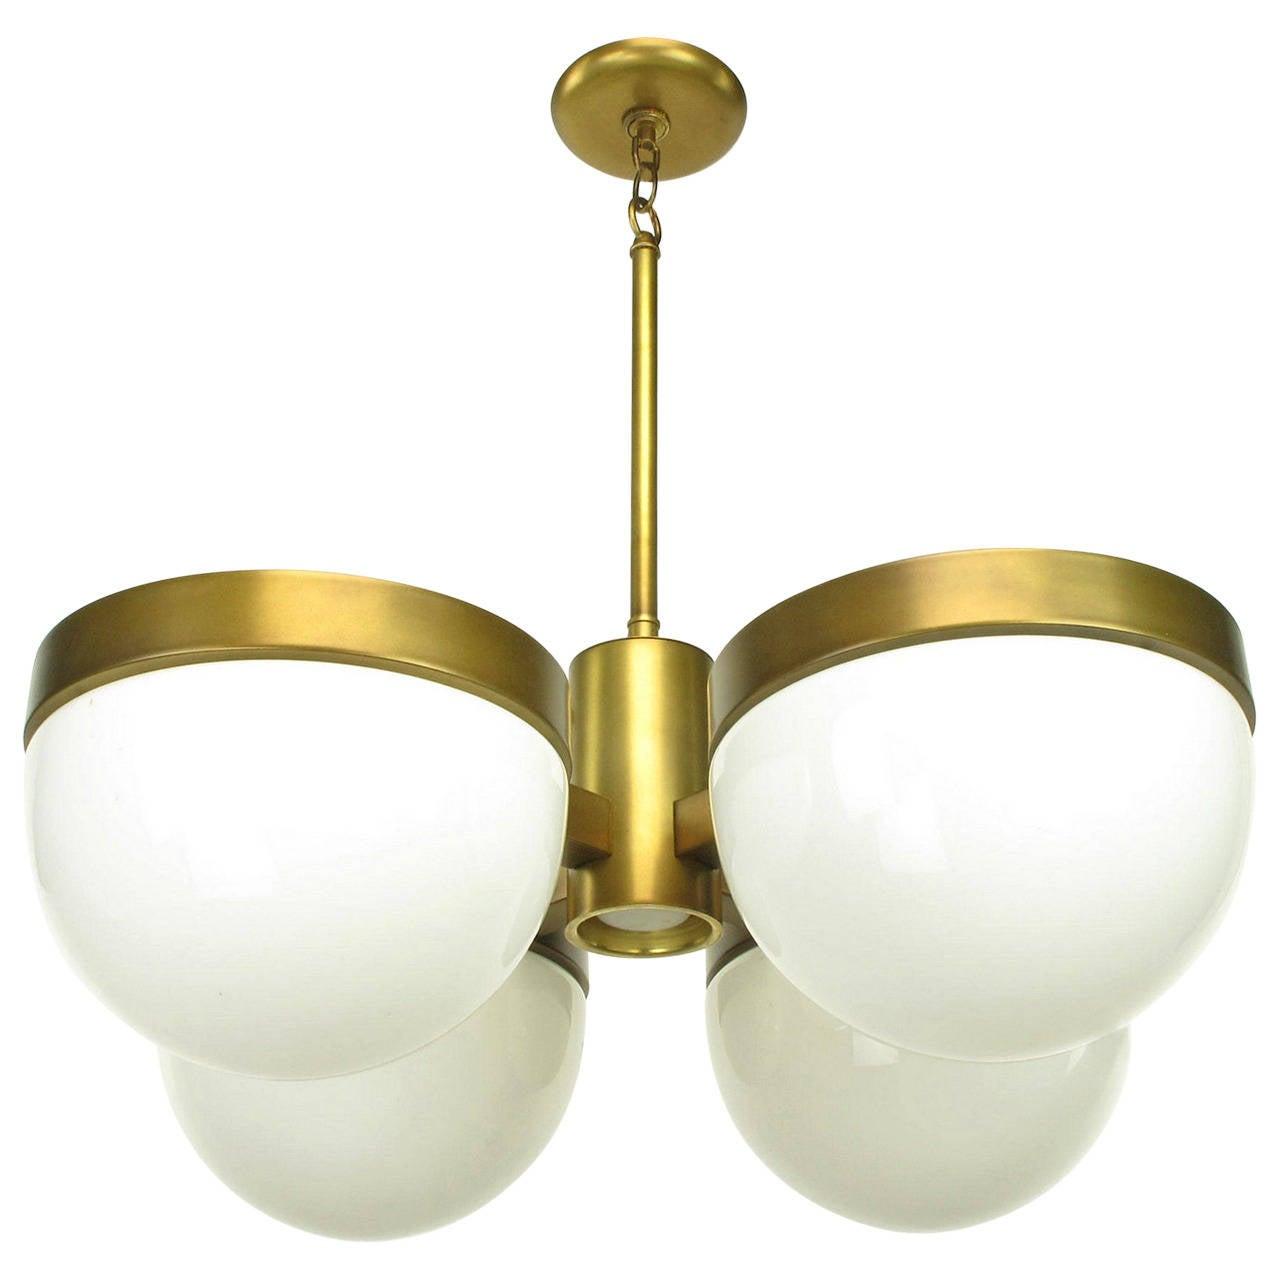 Feldman Lighting Five-Light Hemispherical Milk Glass and Brass Pendant